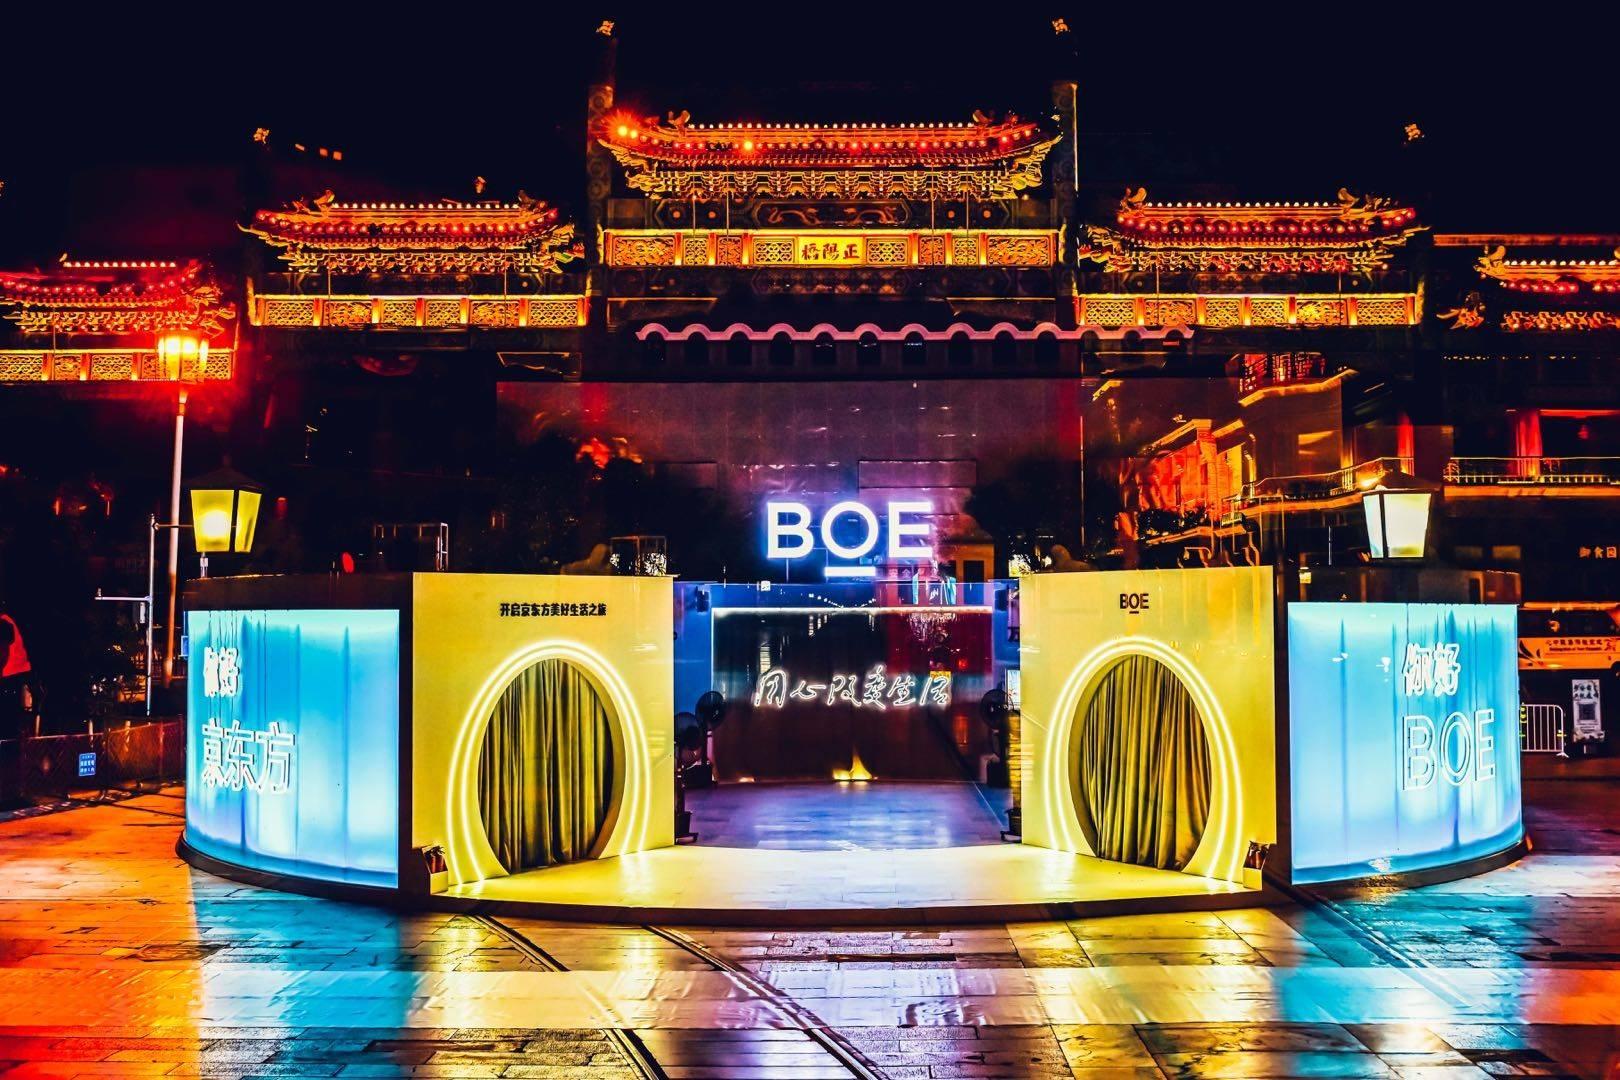 "BOE(京东方) ""你好BOE""美好生活馆全面启动 创新科技赋能品质生活-最极客"